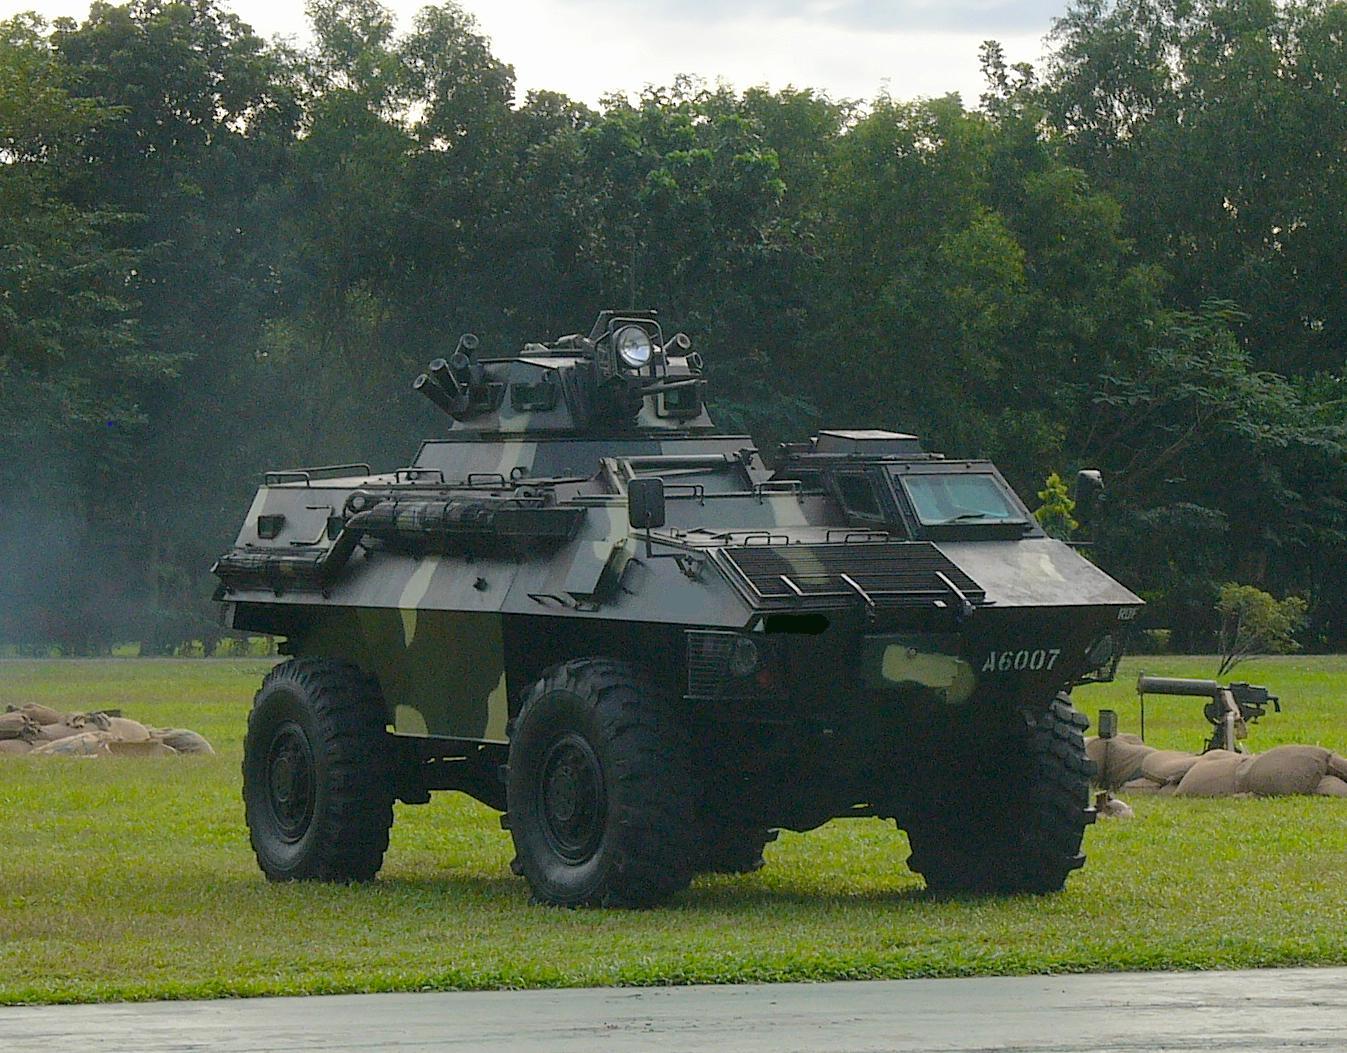 VEHICLE: Simba Light Armored Vehicle